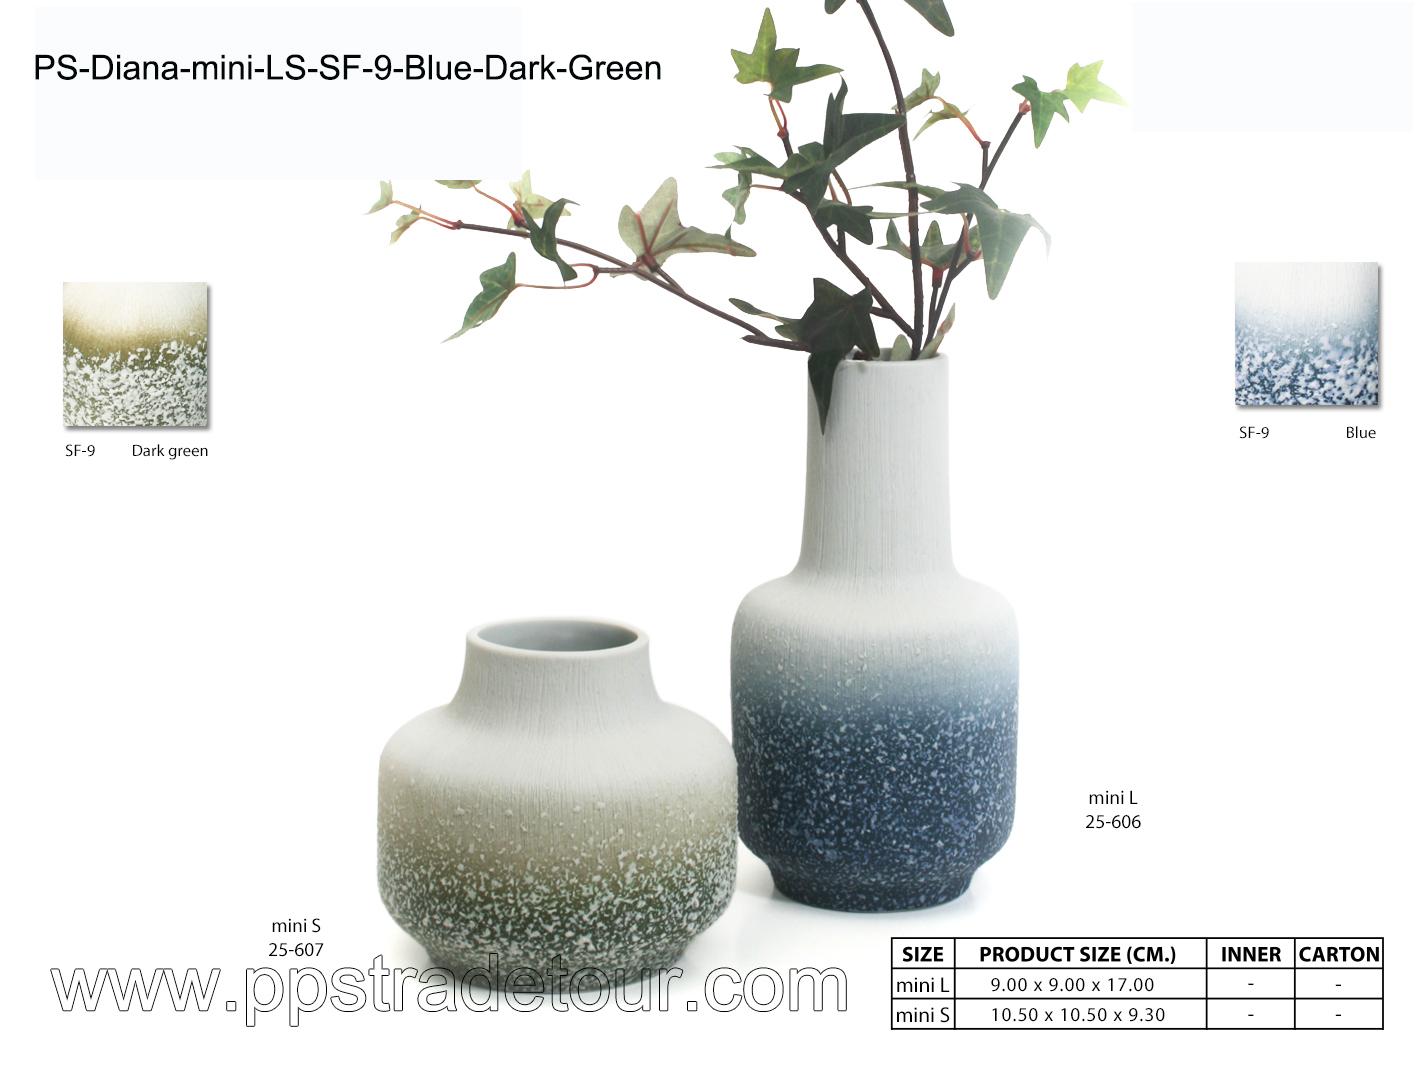 PSCV-Diana-mini-LS-SF-9-BLUE-DARK-GREEN